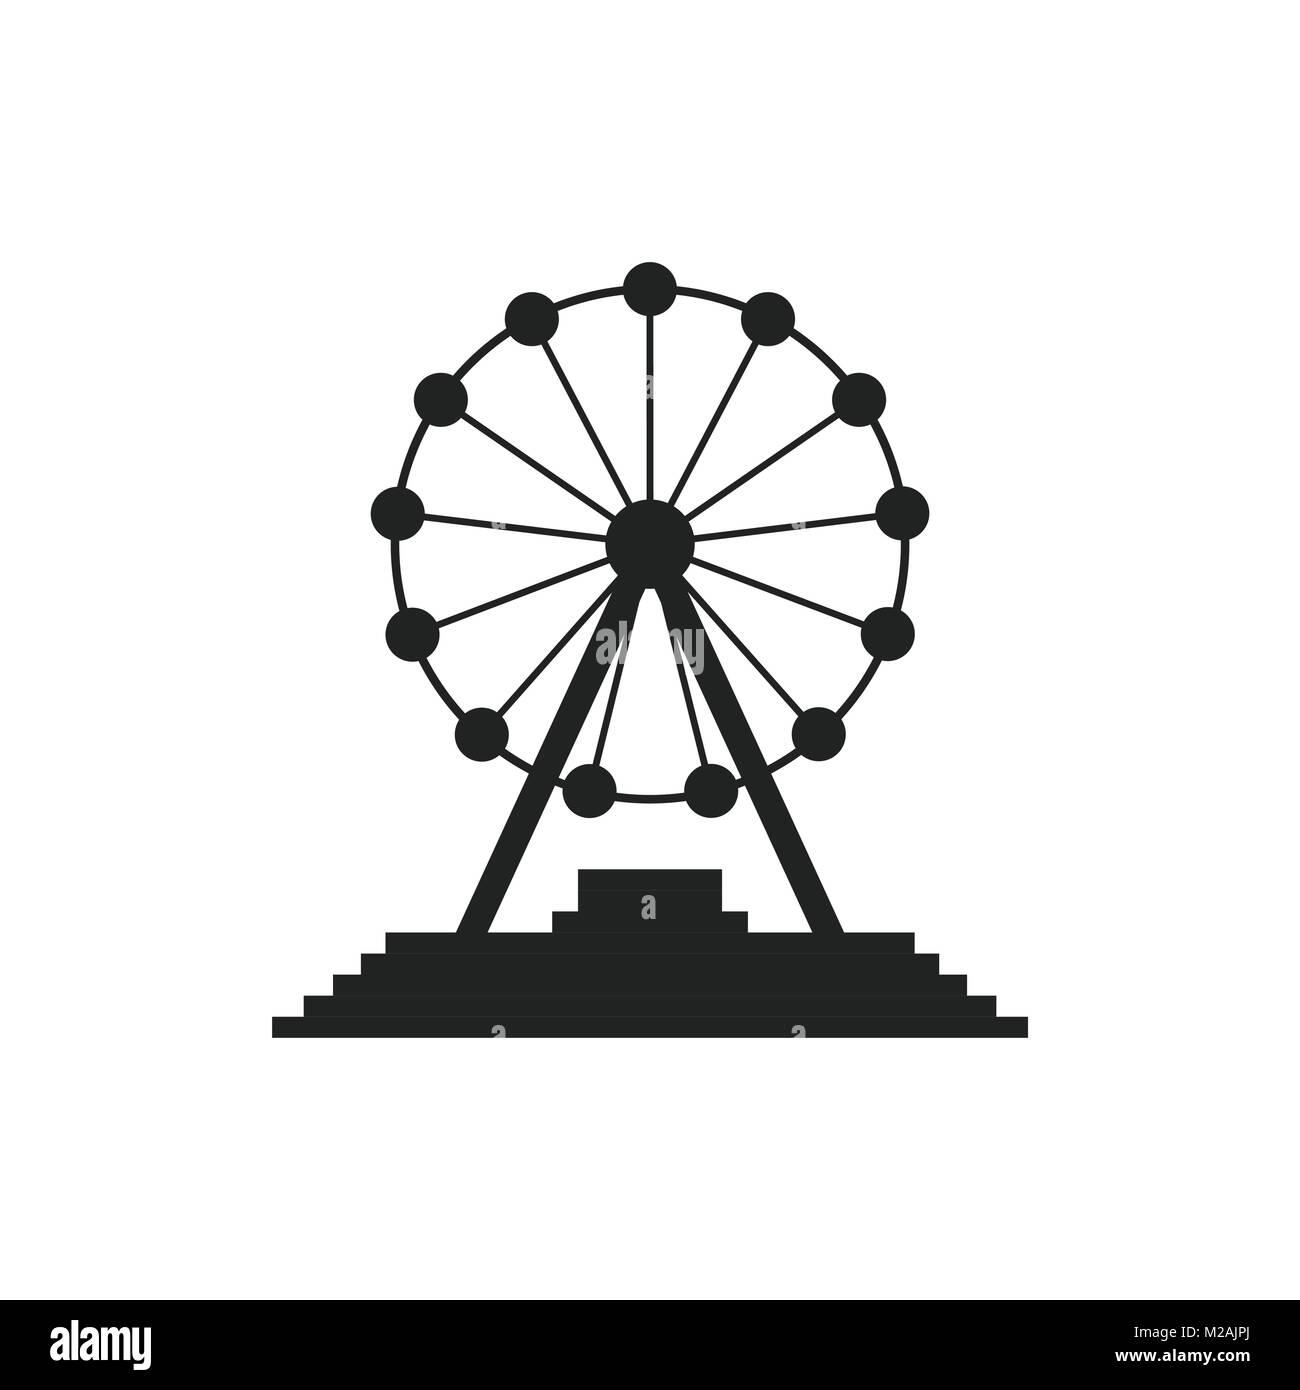 Ferris Wheel Vector Icon Carousel In Park Icon Amusement Ride Stock Vector Image Art Alamy